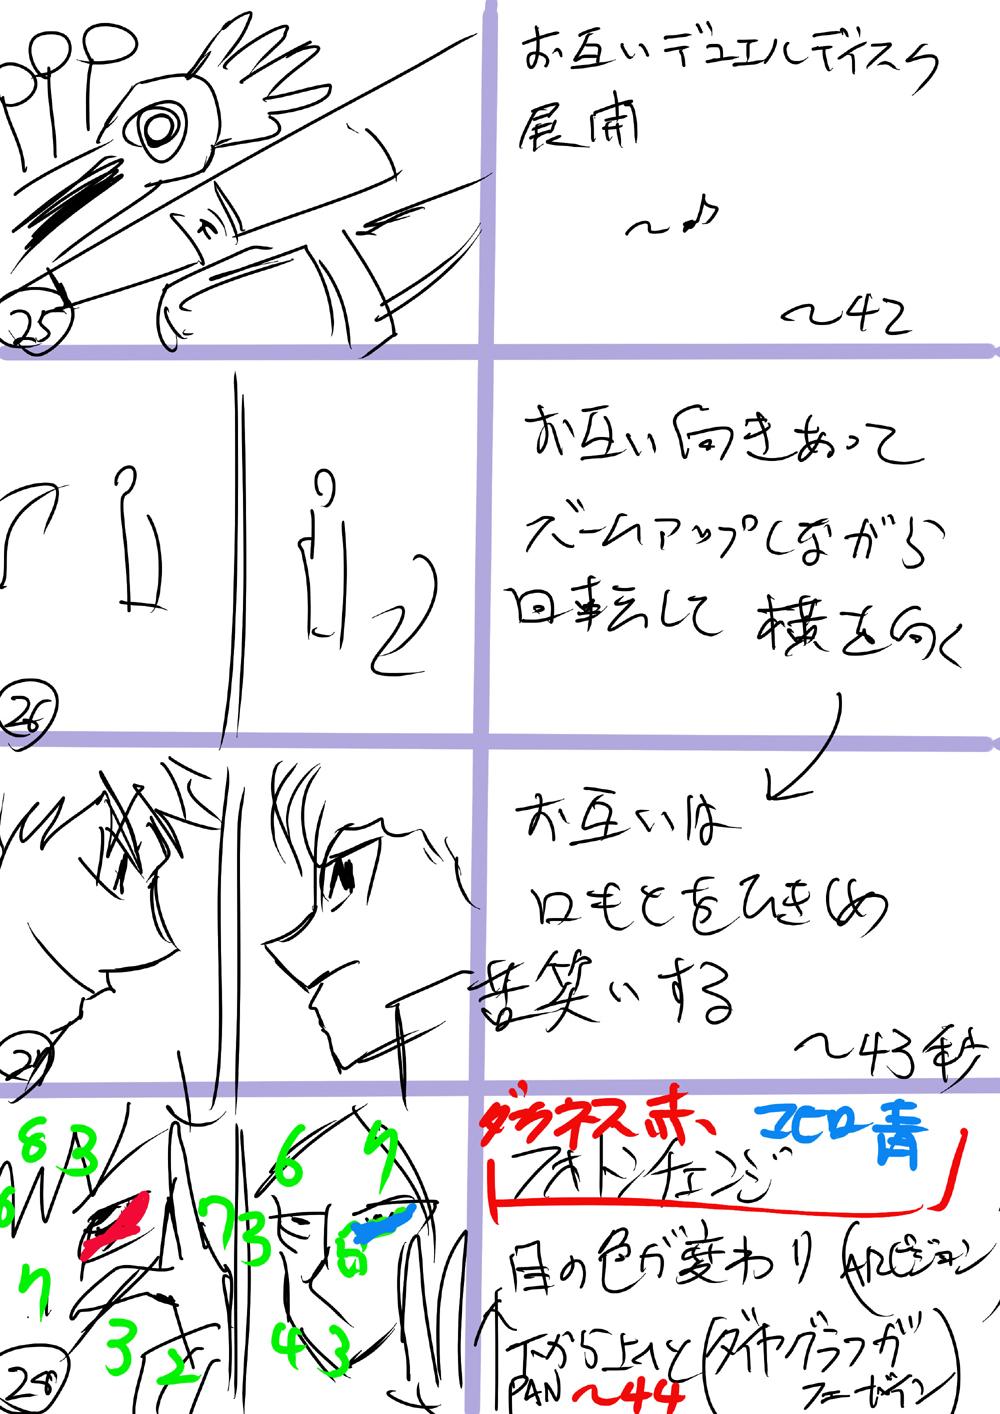 2013040421511965e.jpg